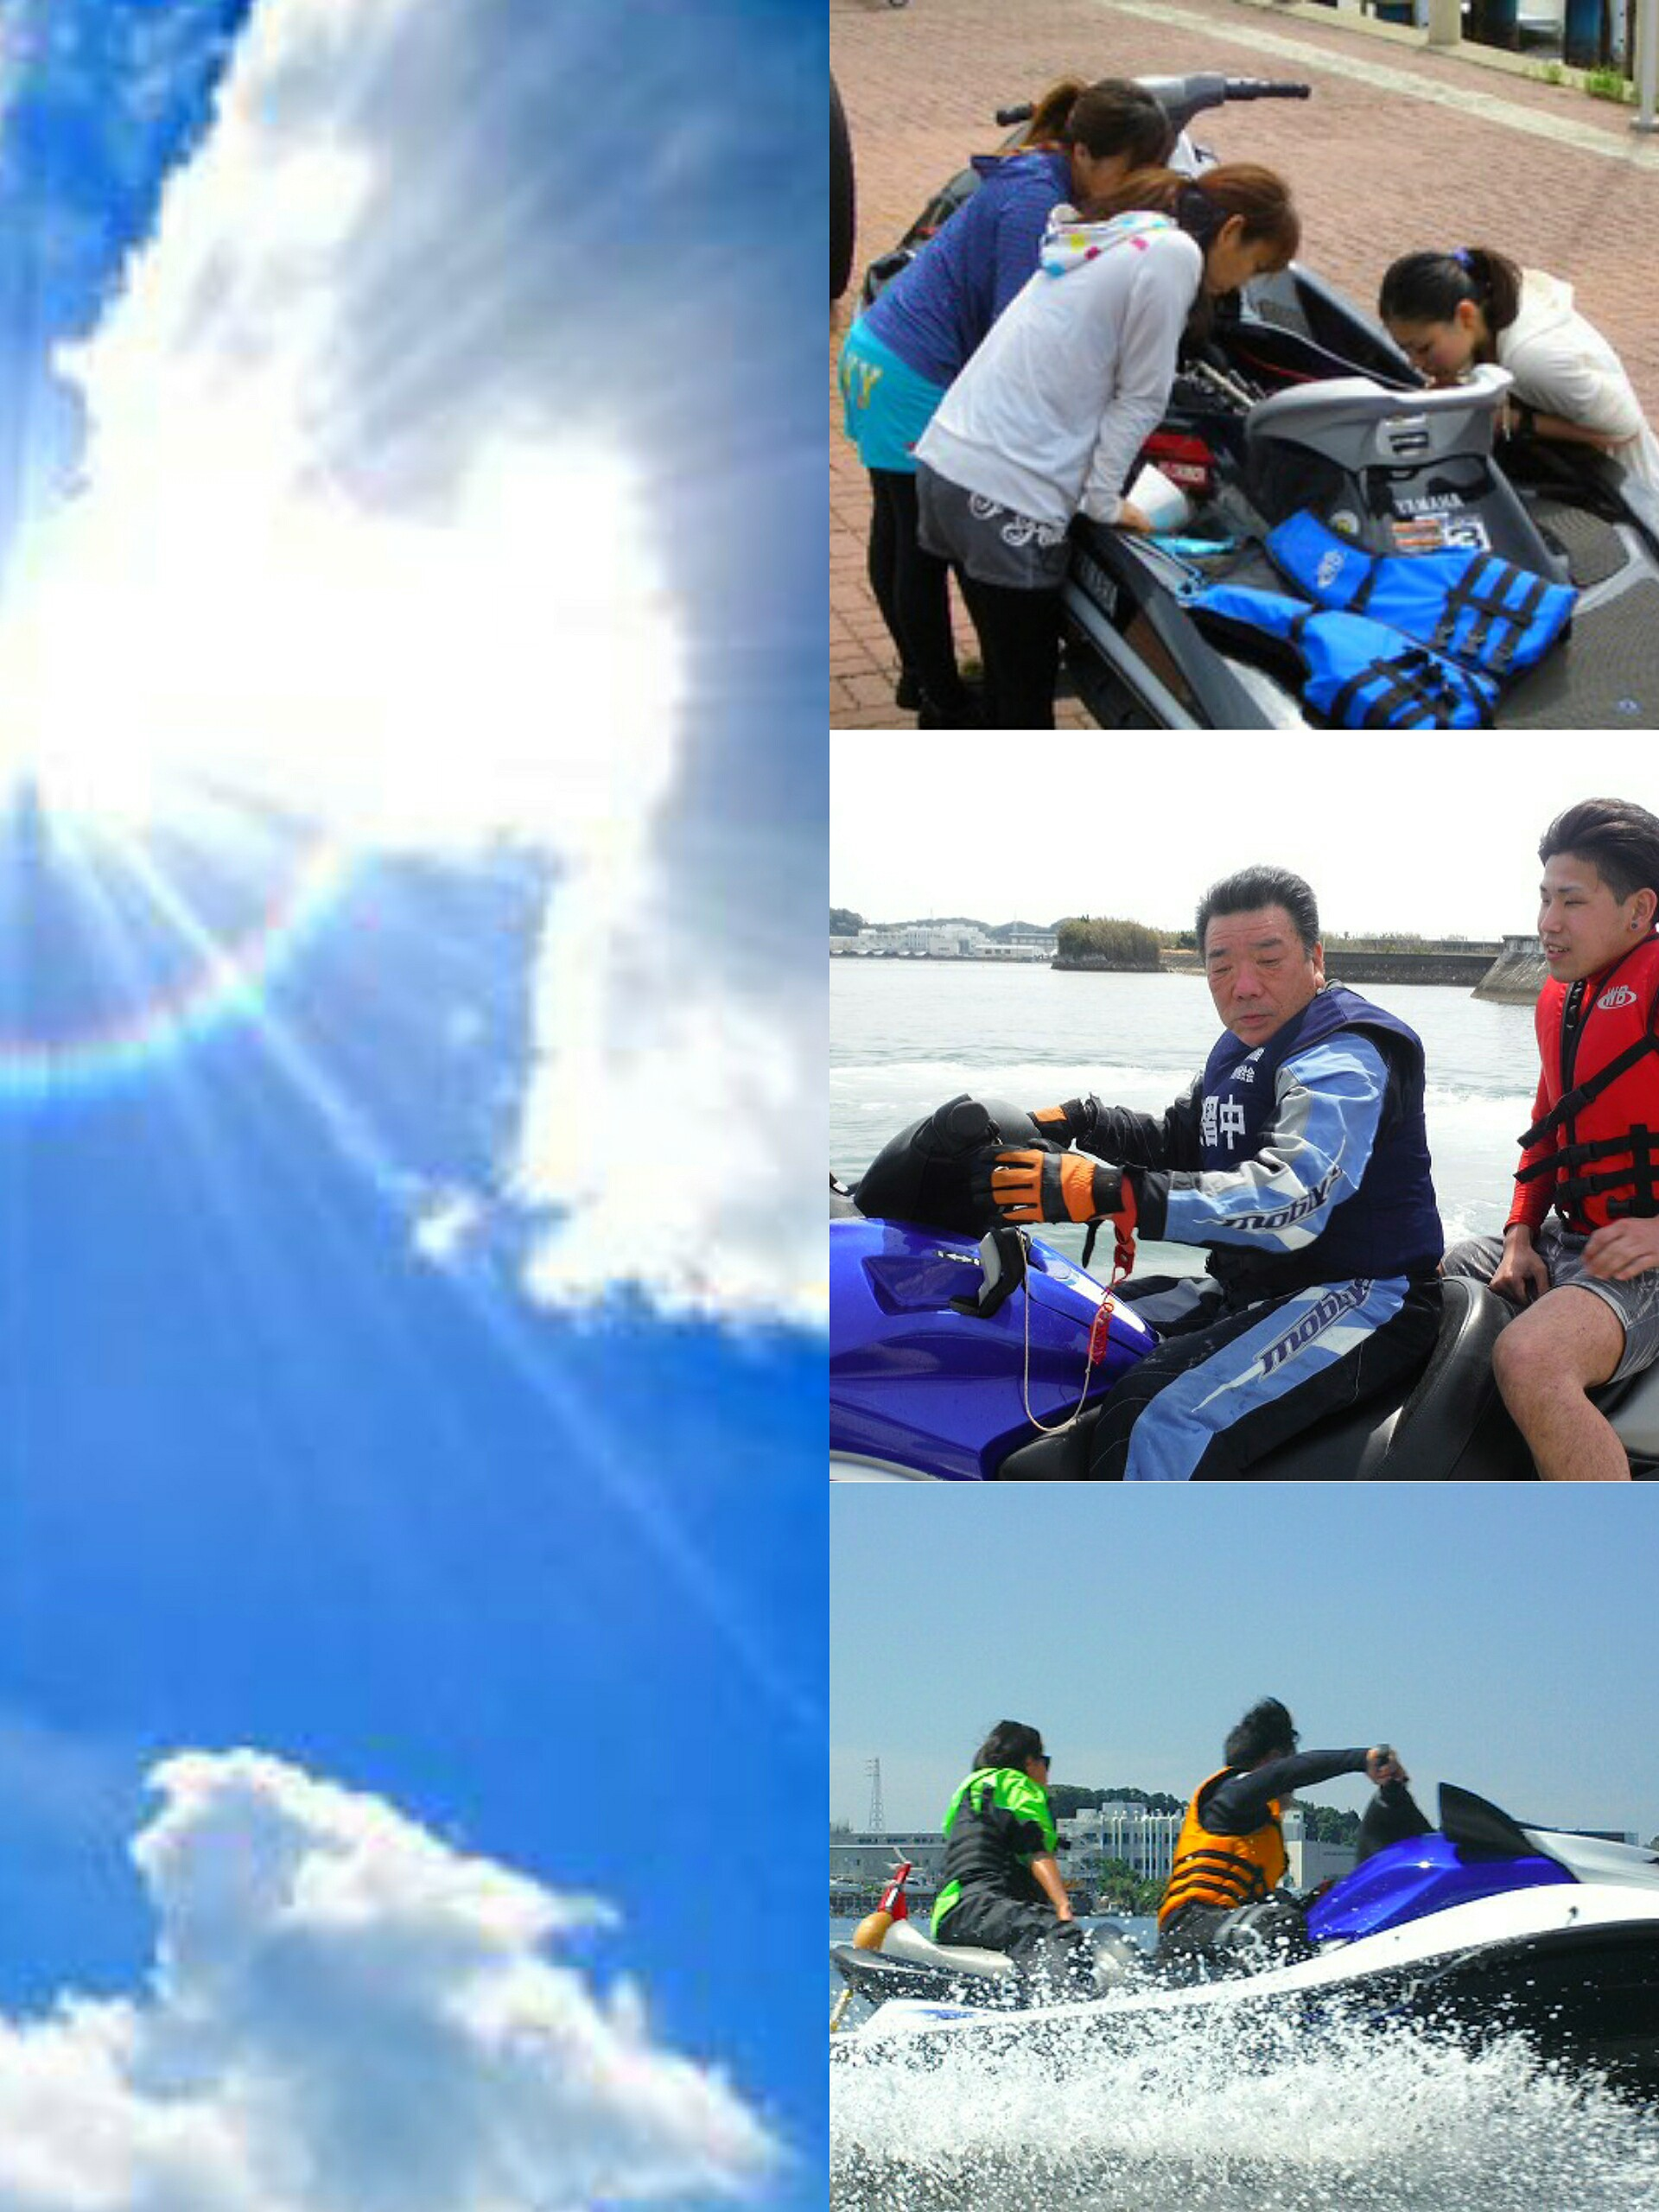 http://www.suzukimarine.co.jp/license/blog/2018/01/24/img/_20180124_153011.JPG